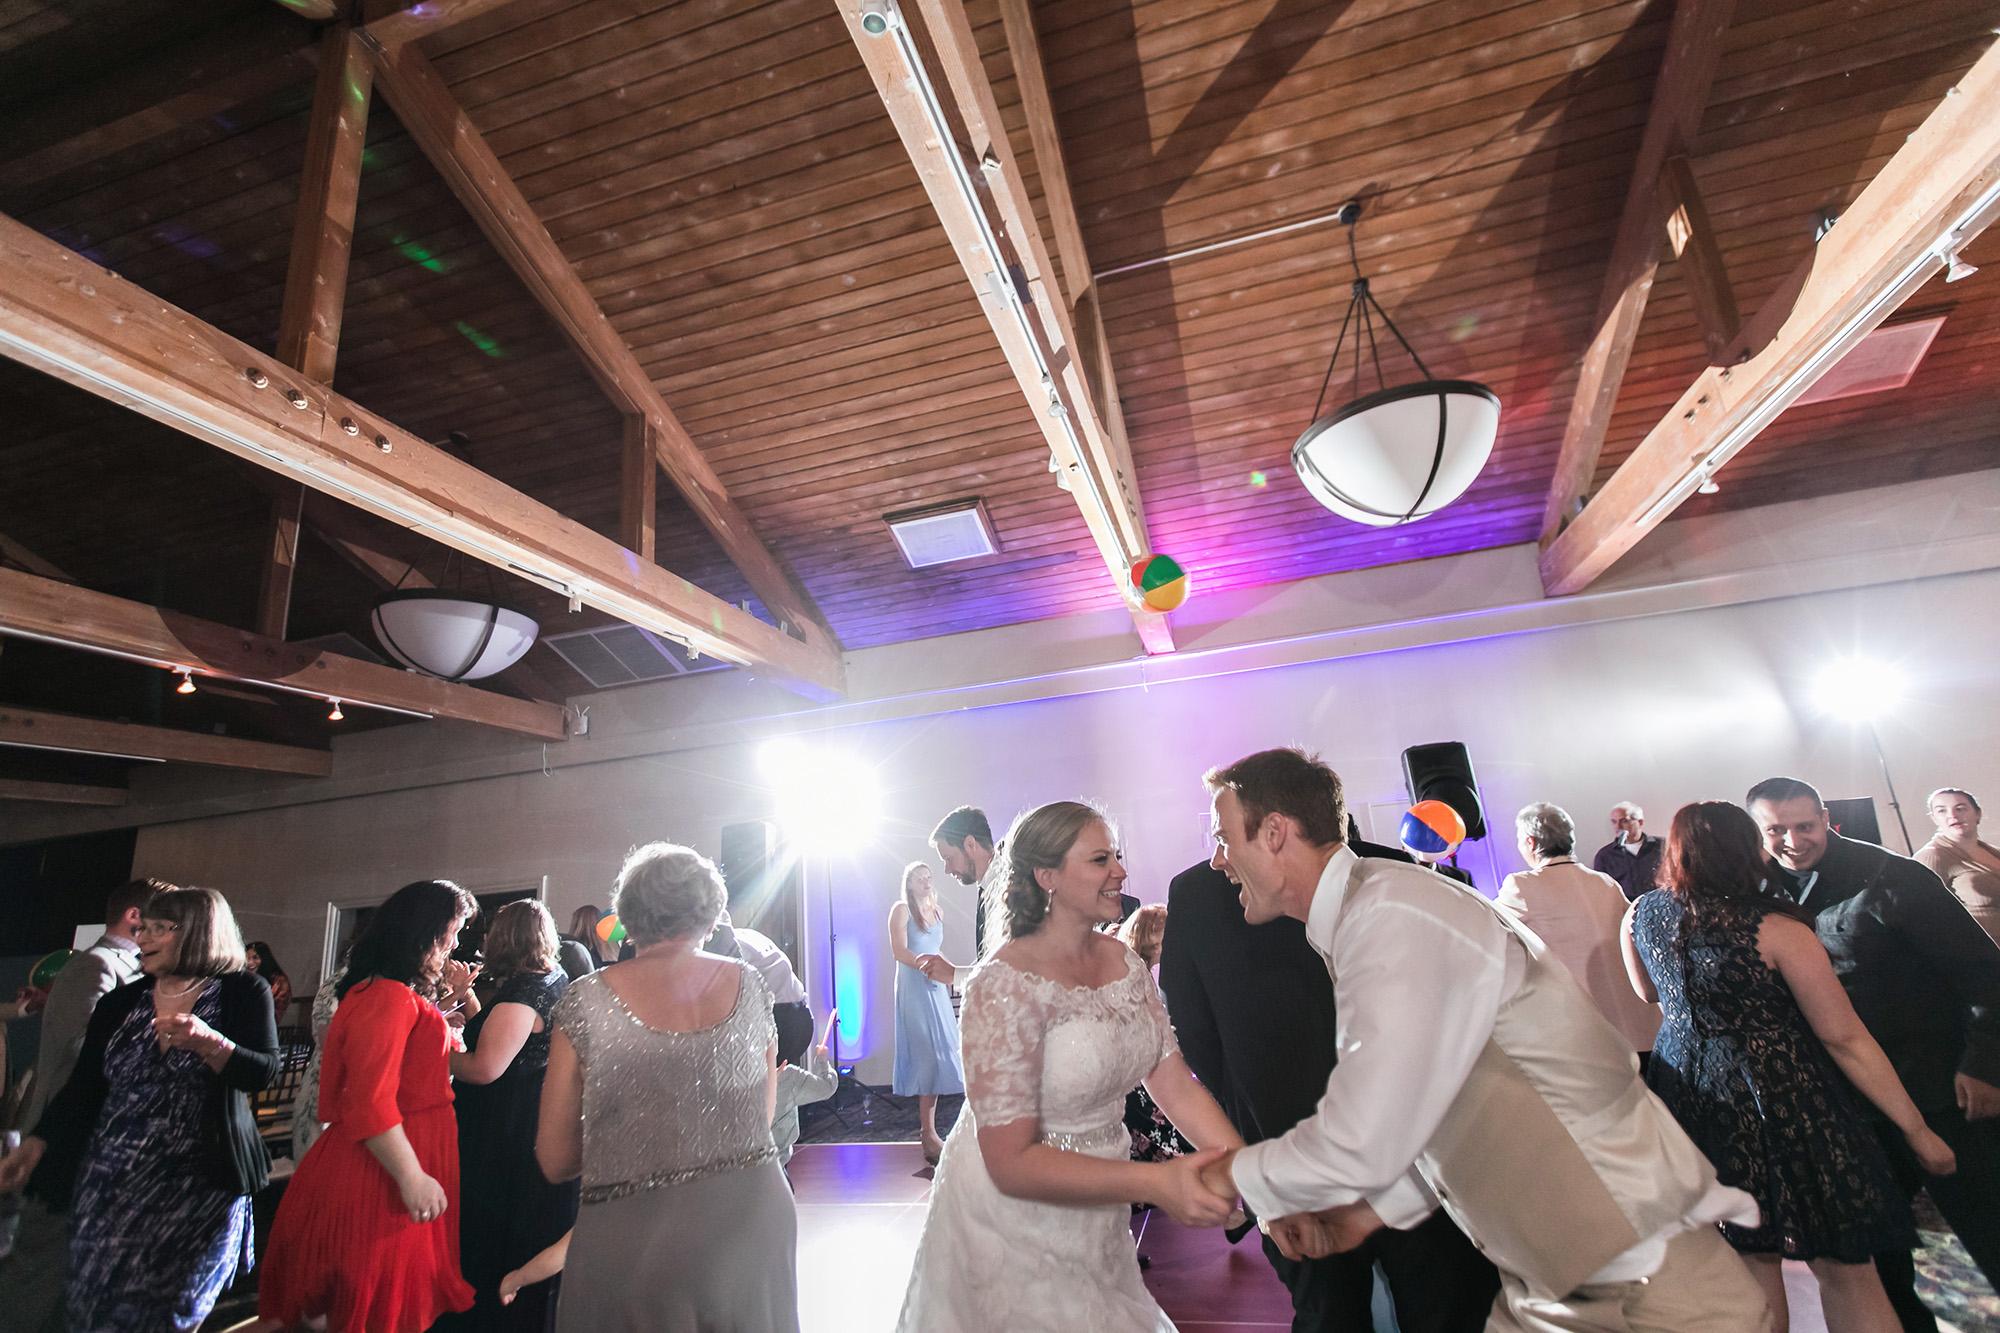 unforgettable-st-monica-wedding-carrie-vines-photography-129.jpg